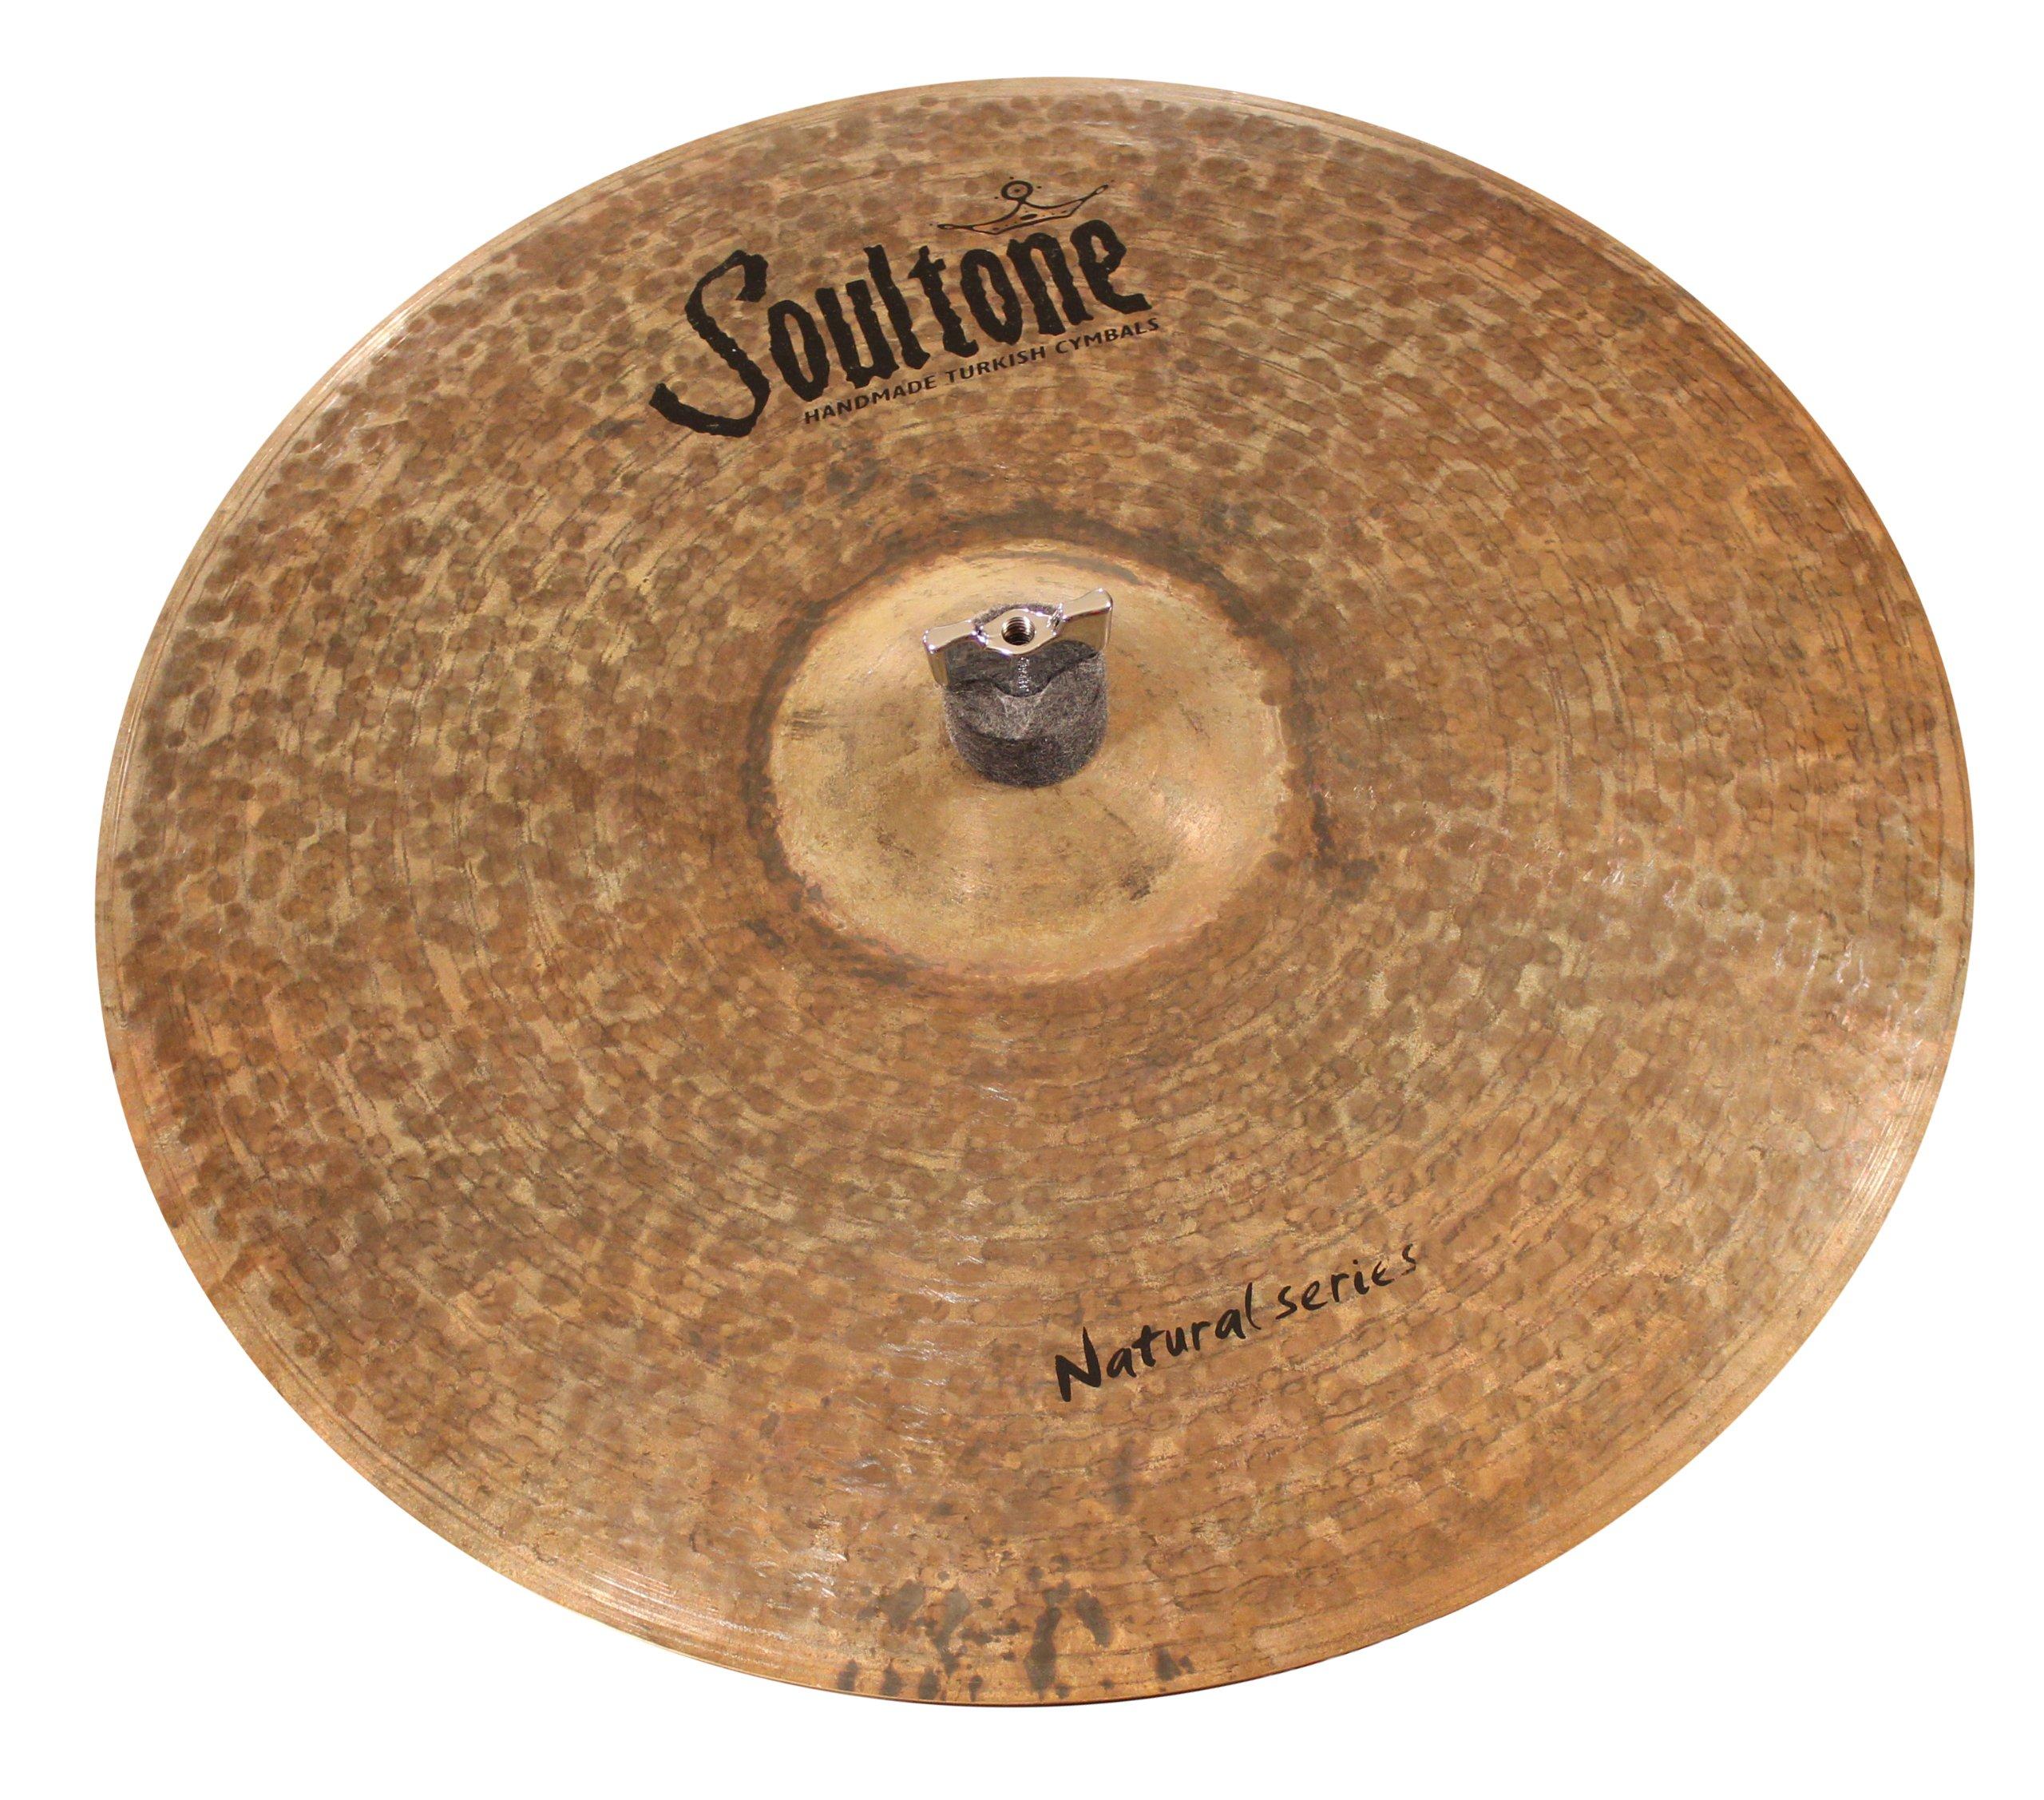 Soultone Cymbals NTR-CRS20-20'' Natural Crash by Soultone Cymbals